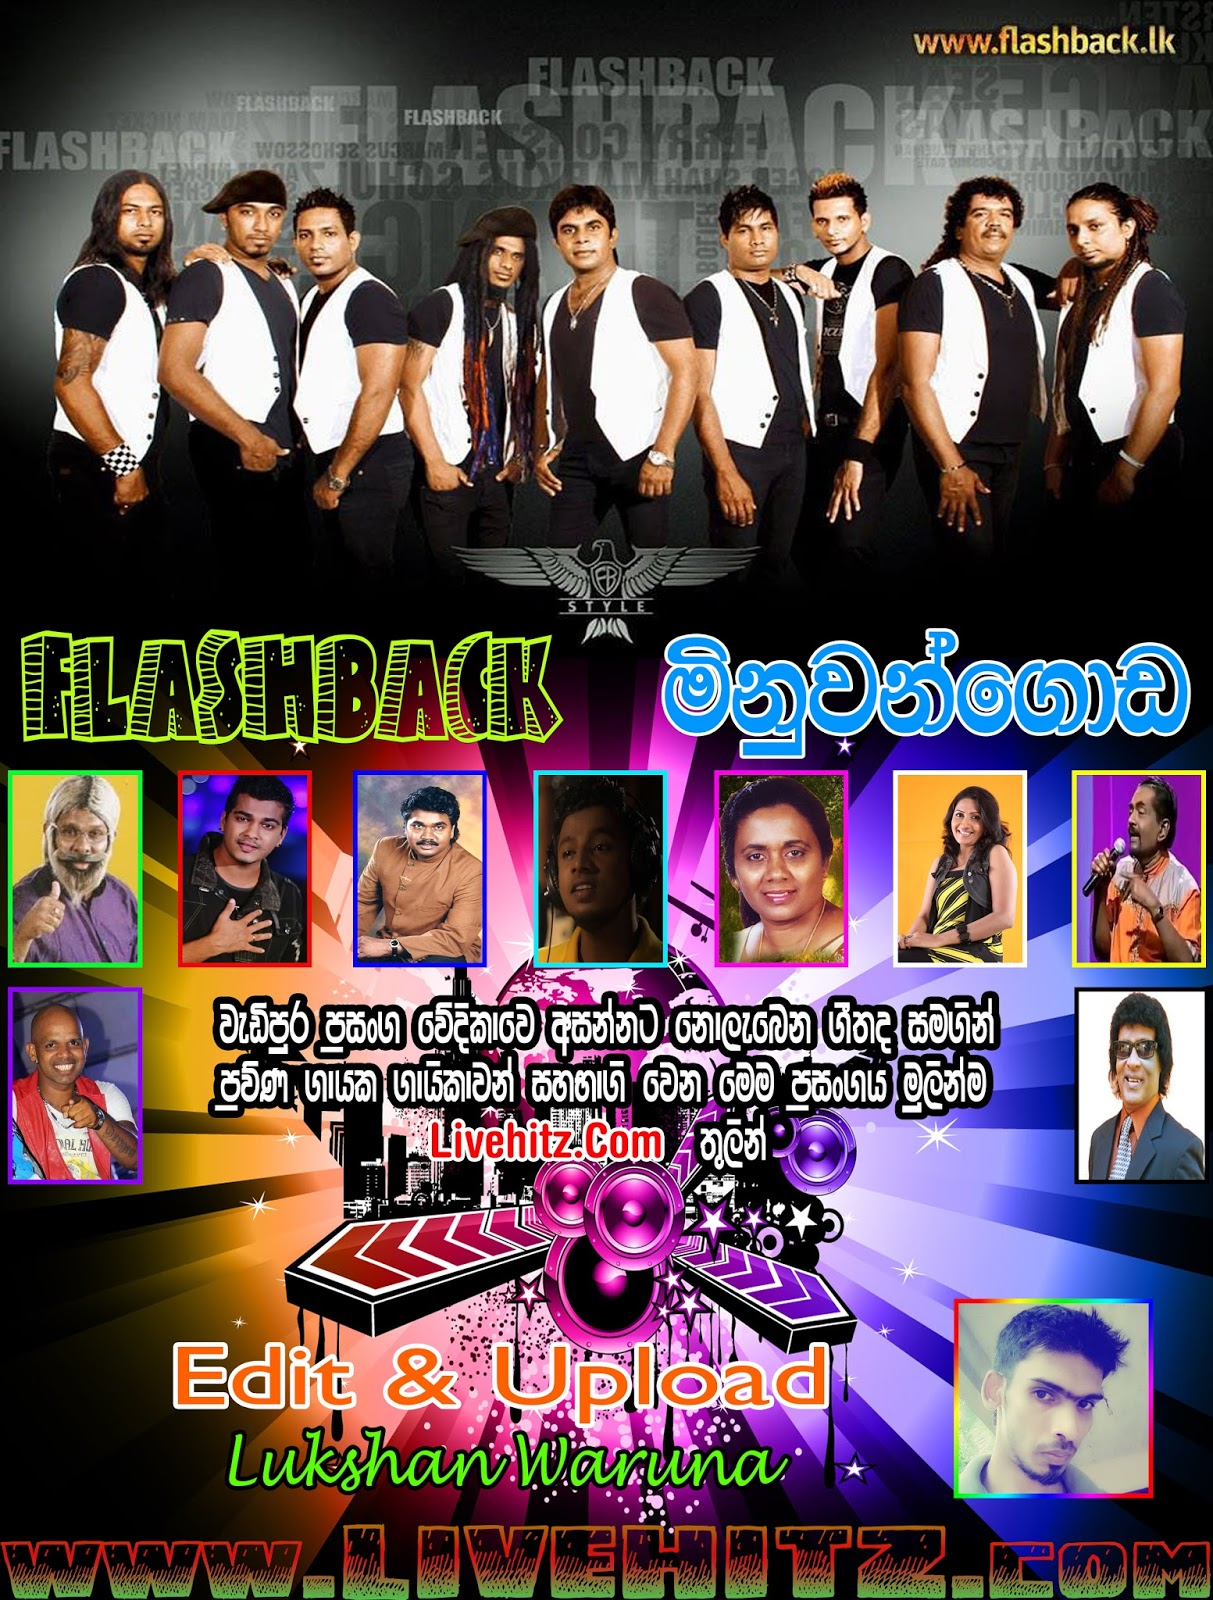 Kawadi Baila With Flashback Mp3 Download [legends-legacies]